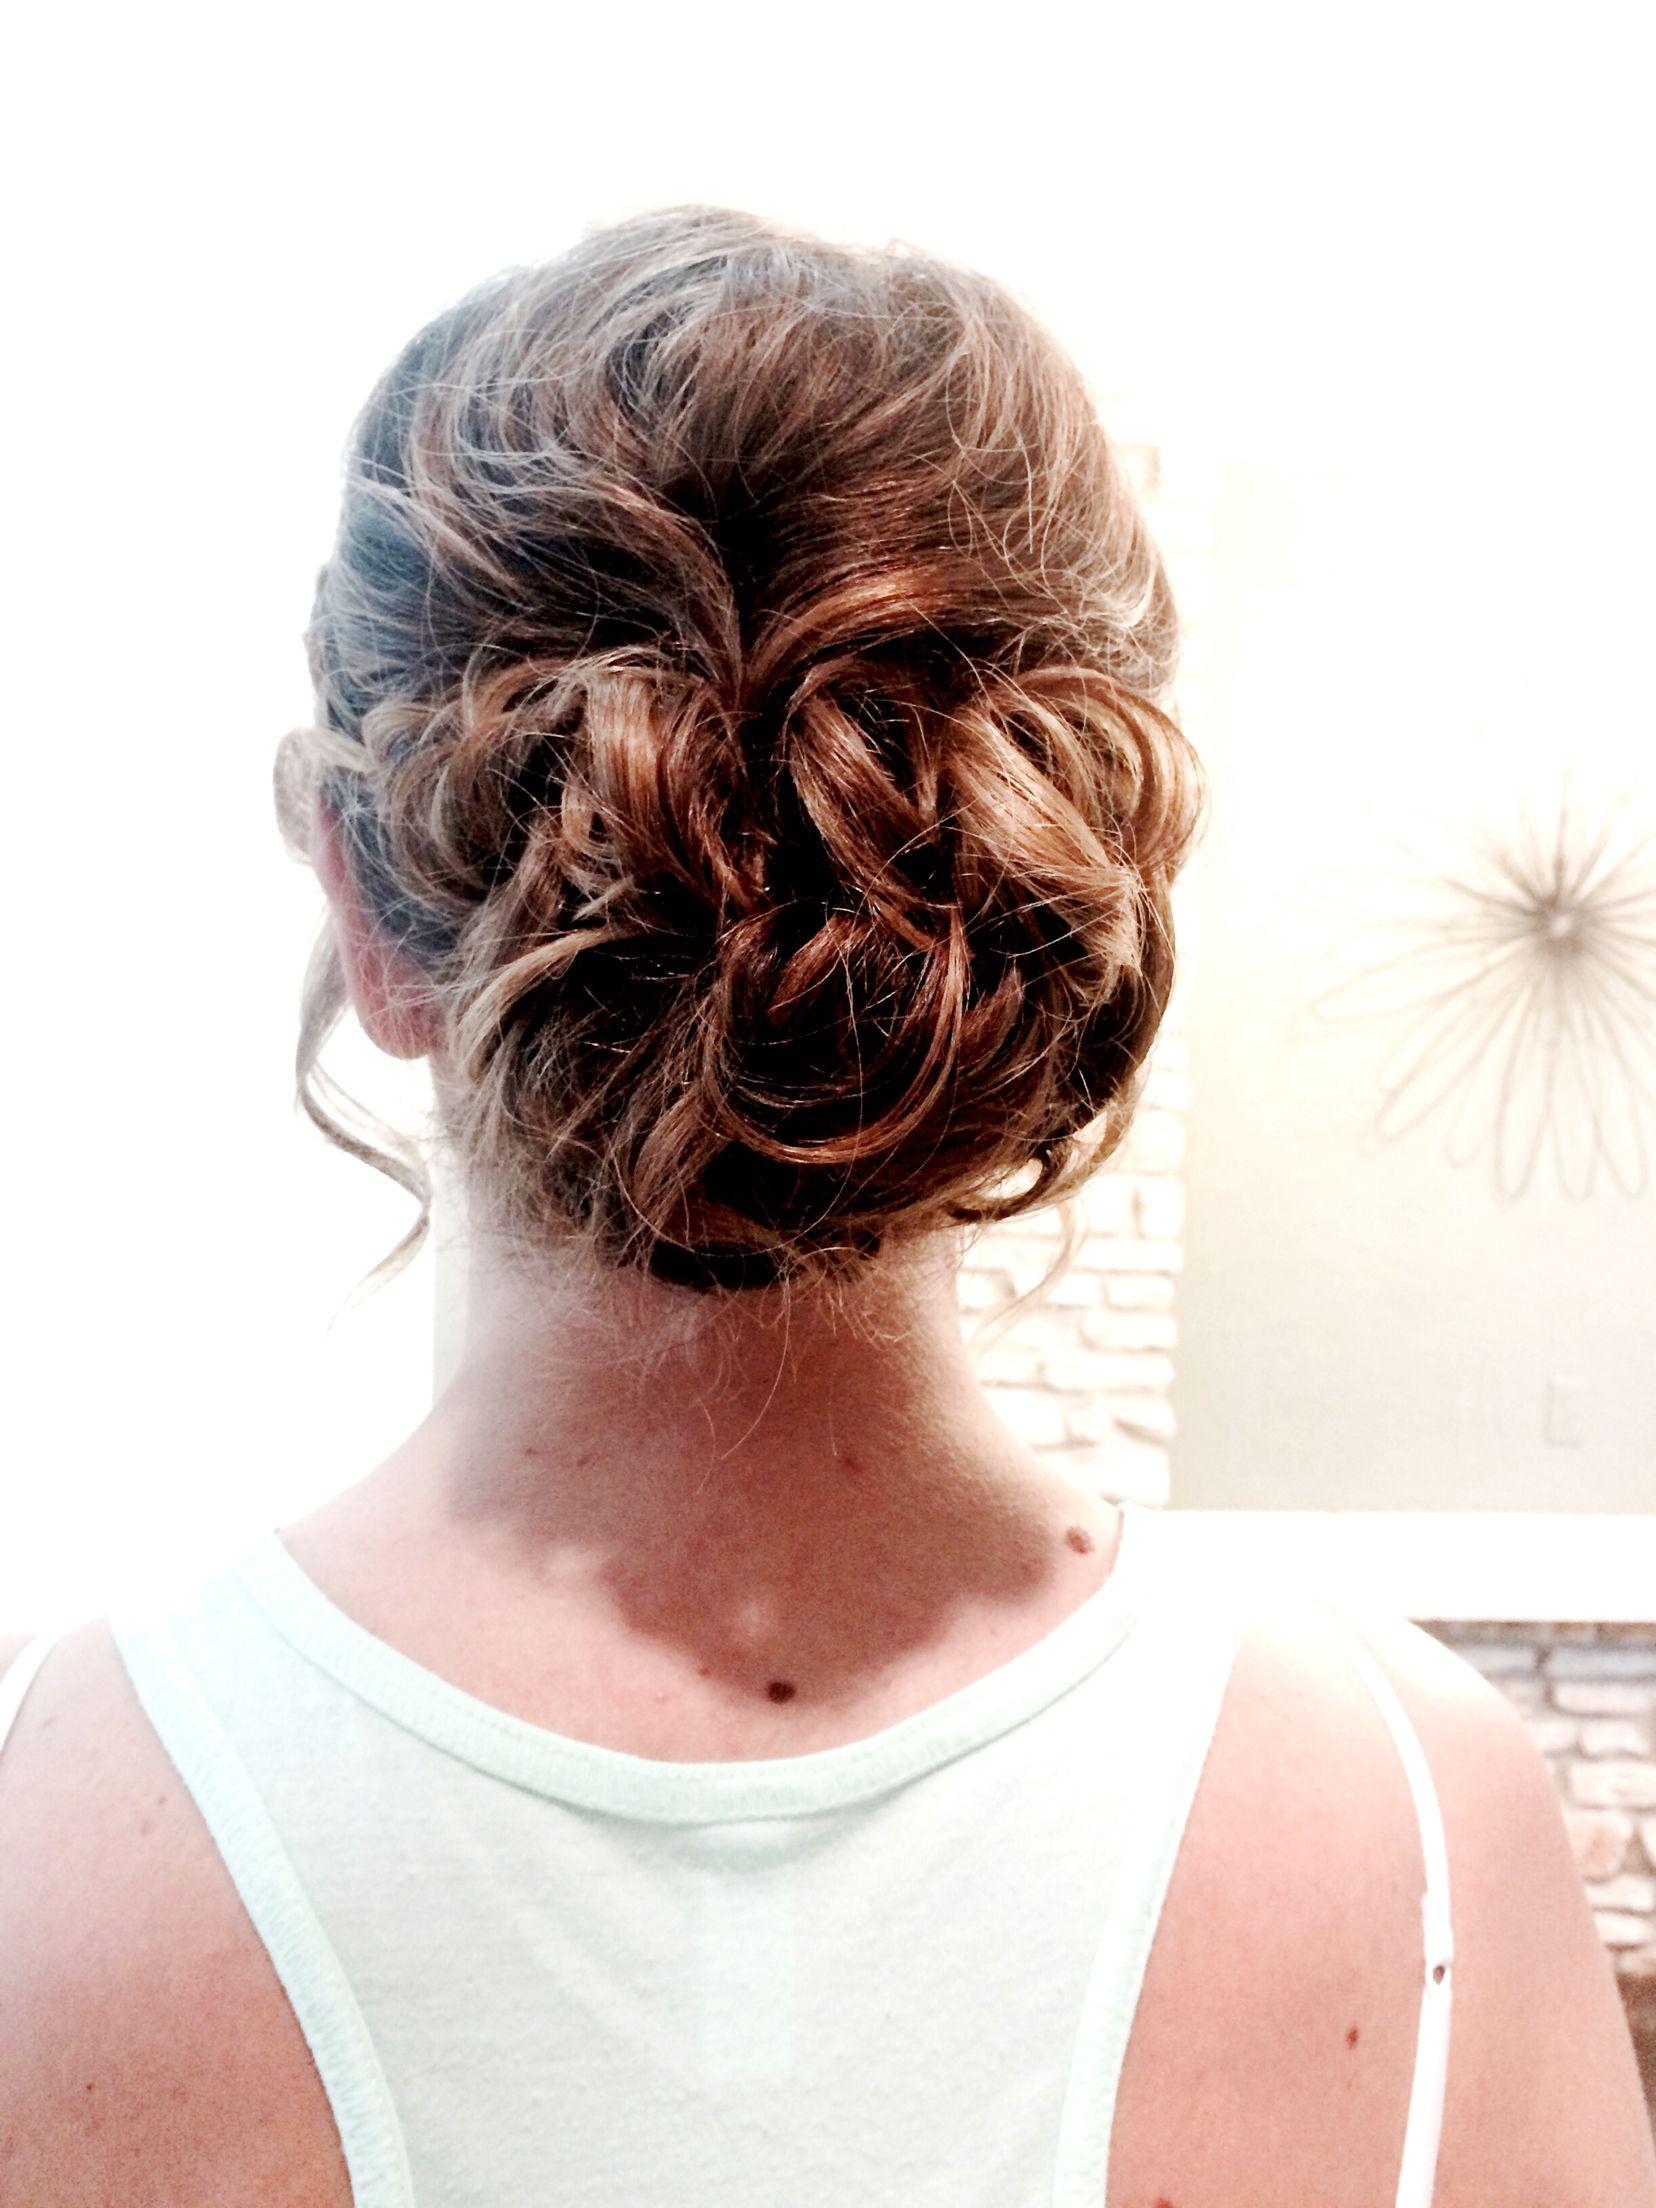 Wedding Hair By Flair Style Lounge Austin Tx Wedding Hair And Makeup Wedding Hairstyles Hair Makeup